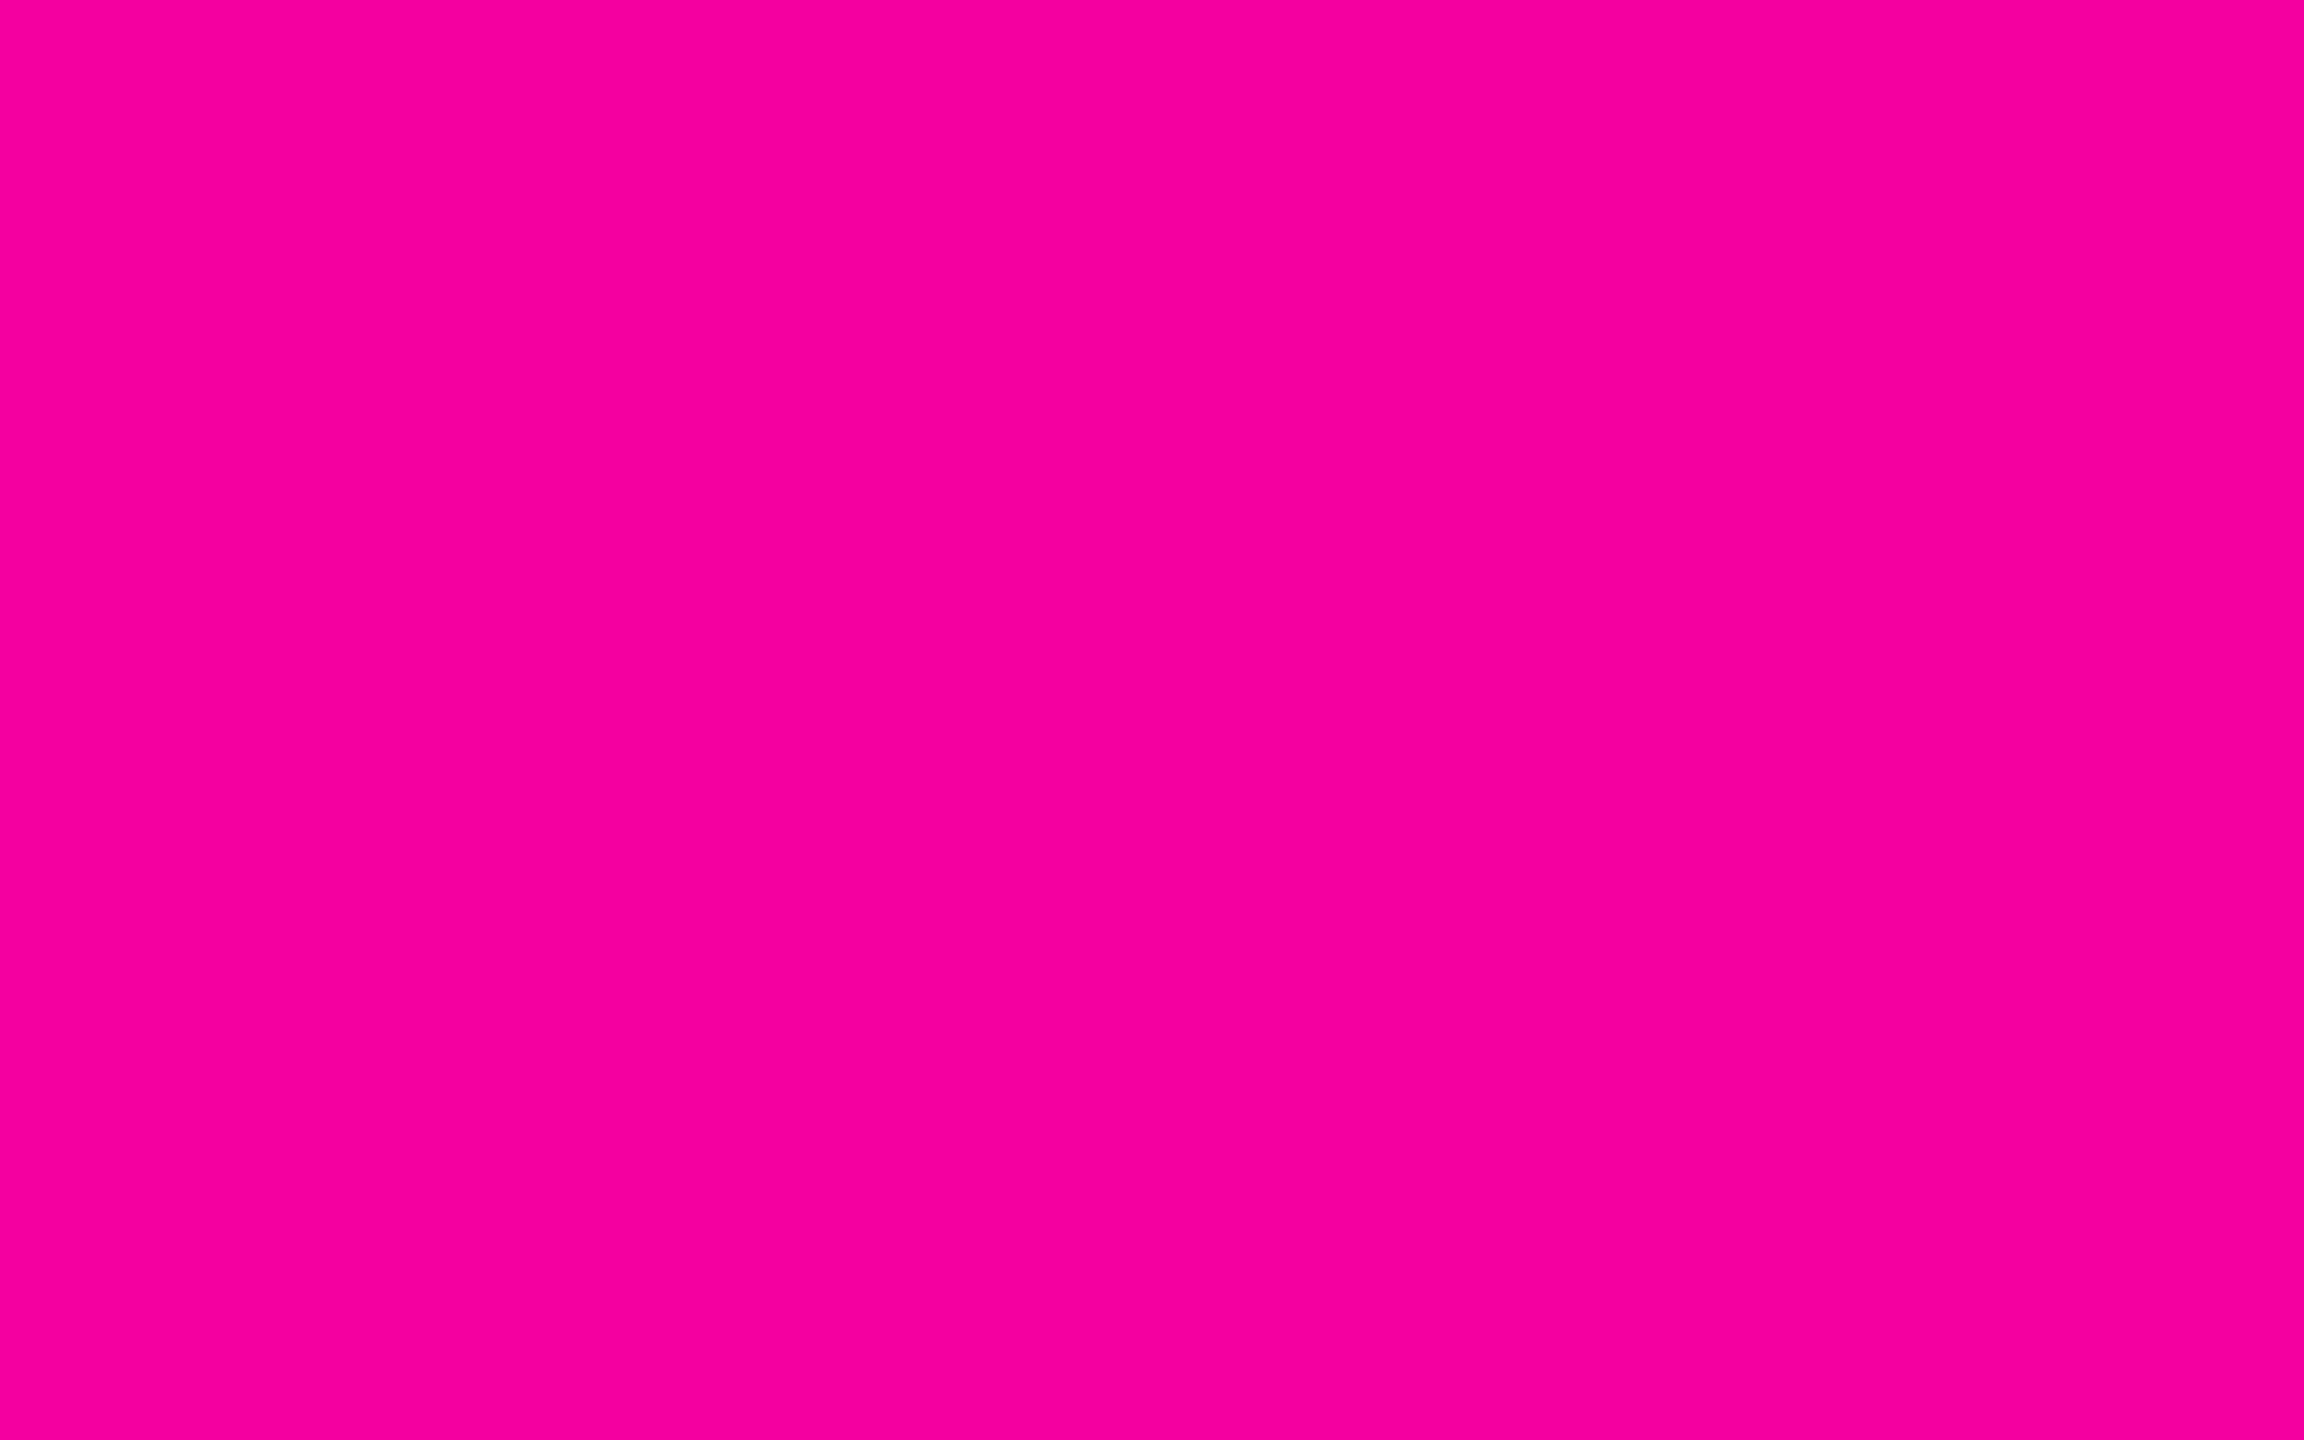 2304x1440 Fashion Fuchsia Solid Color Background